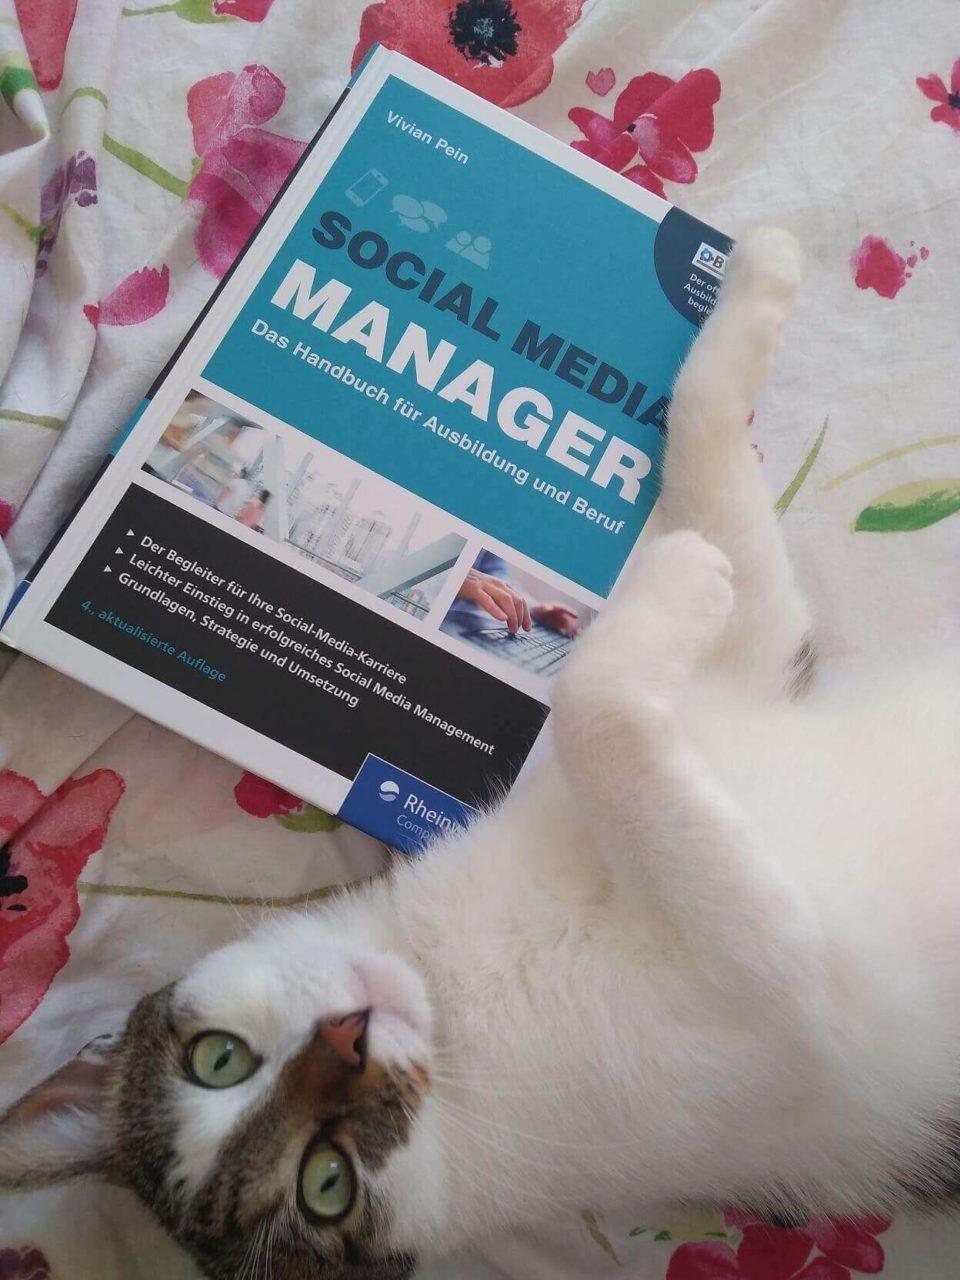 Kater Finlay mit dem Buch Social Media Manager